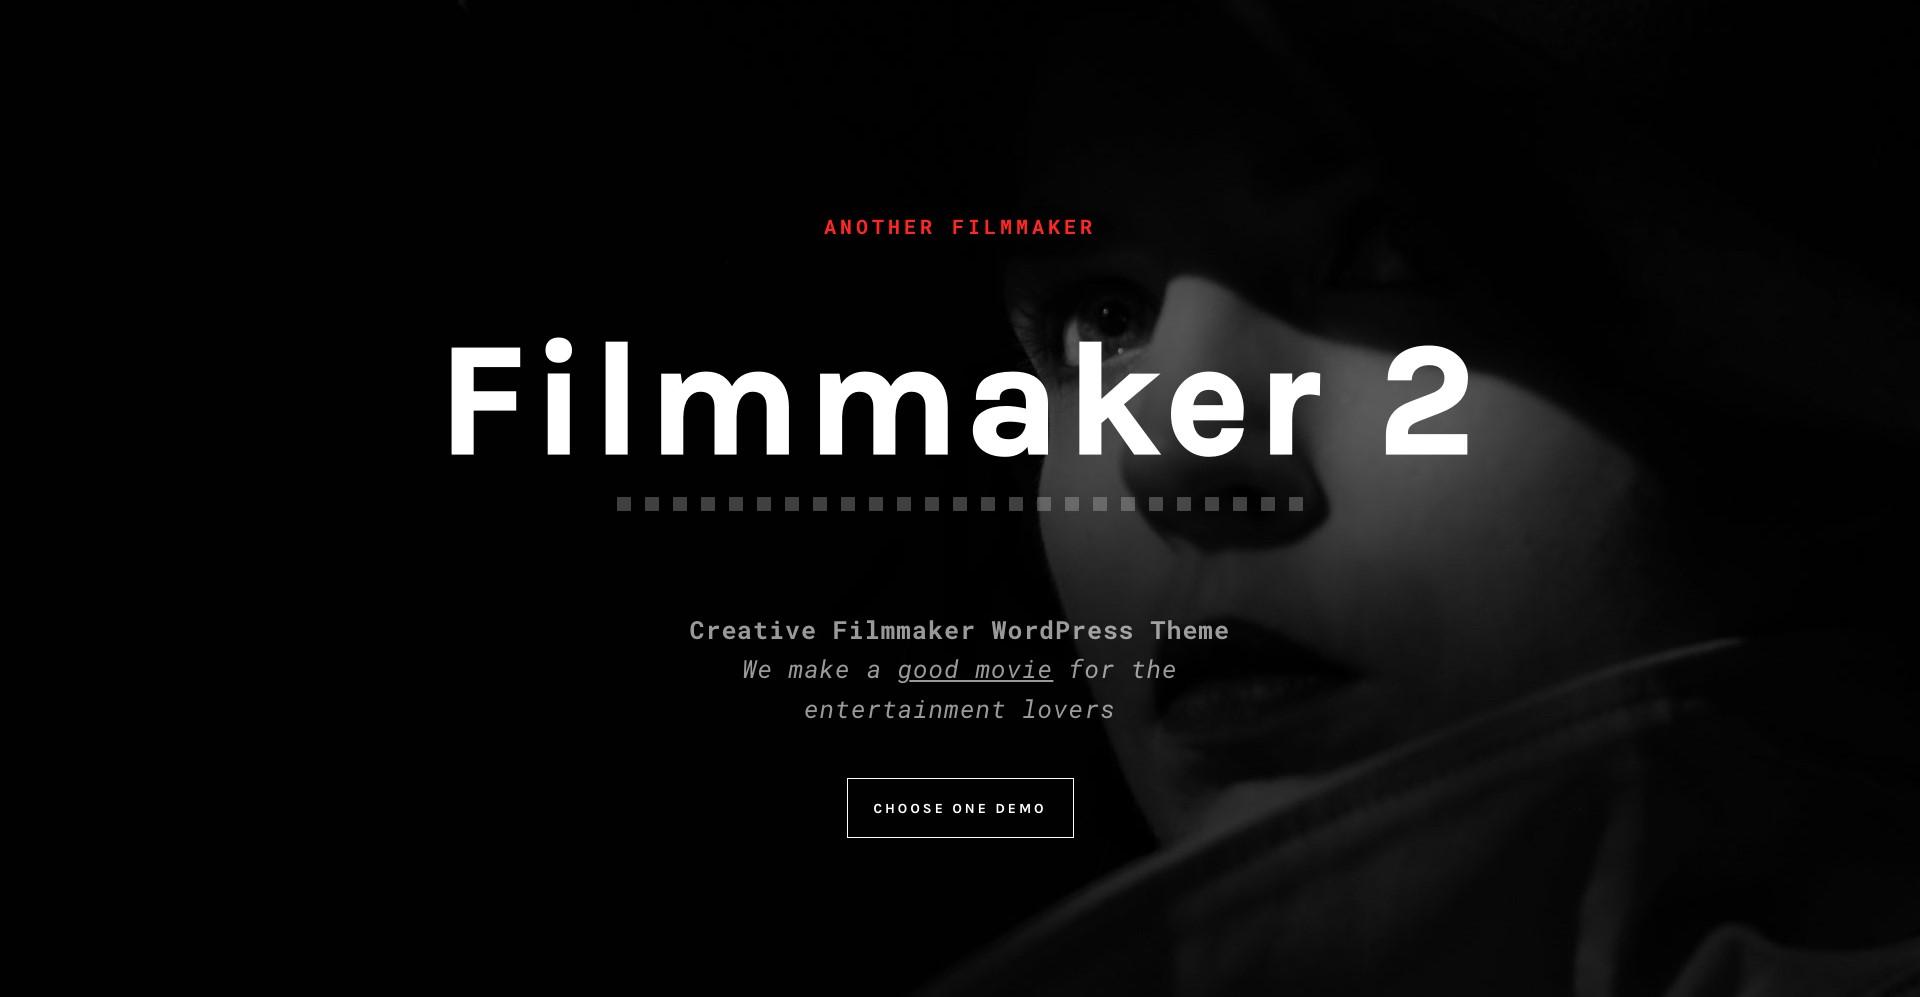 filmmaker 2 movie wordpress theme